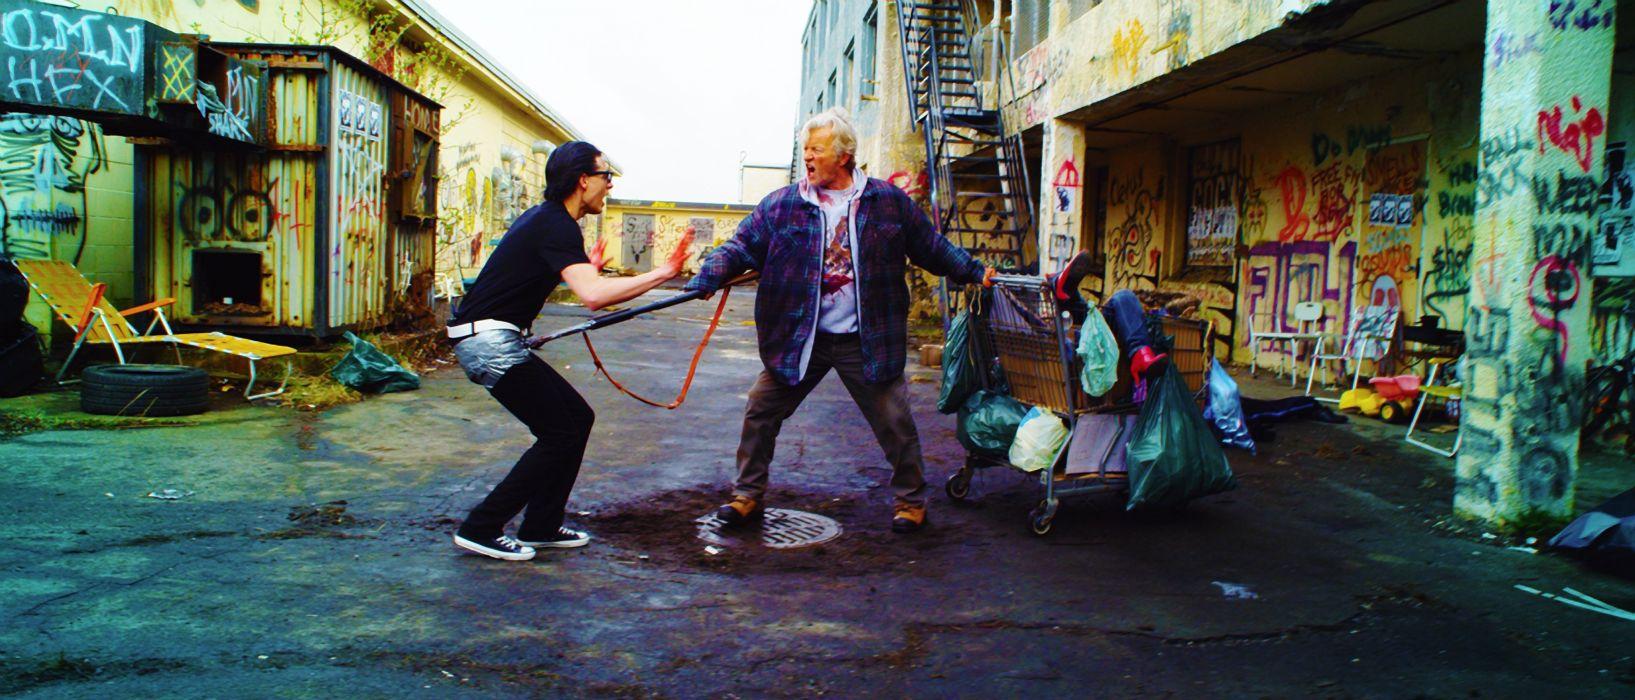 HOBO WITH A SHOTGUN action comedy thriller dark blood wallpaper